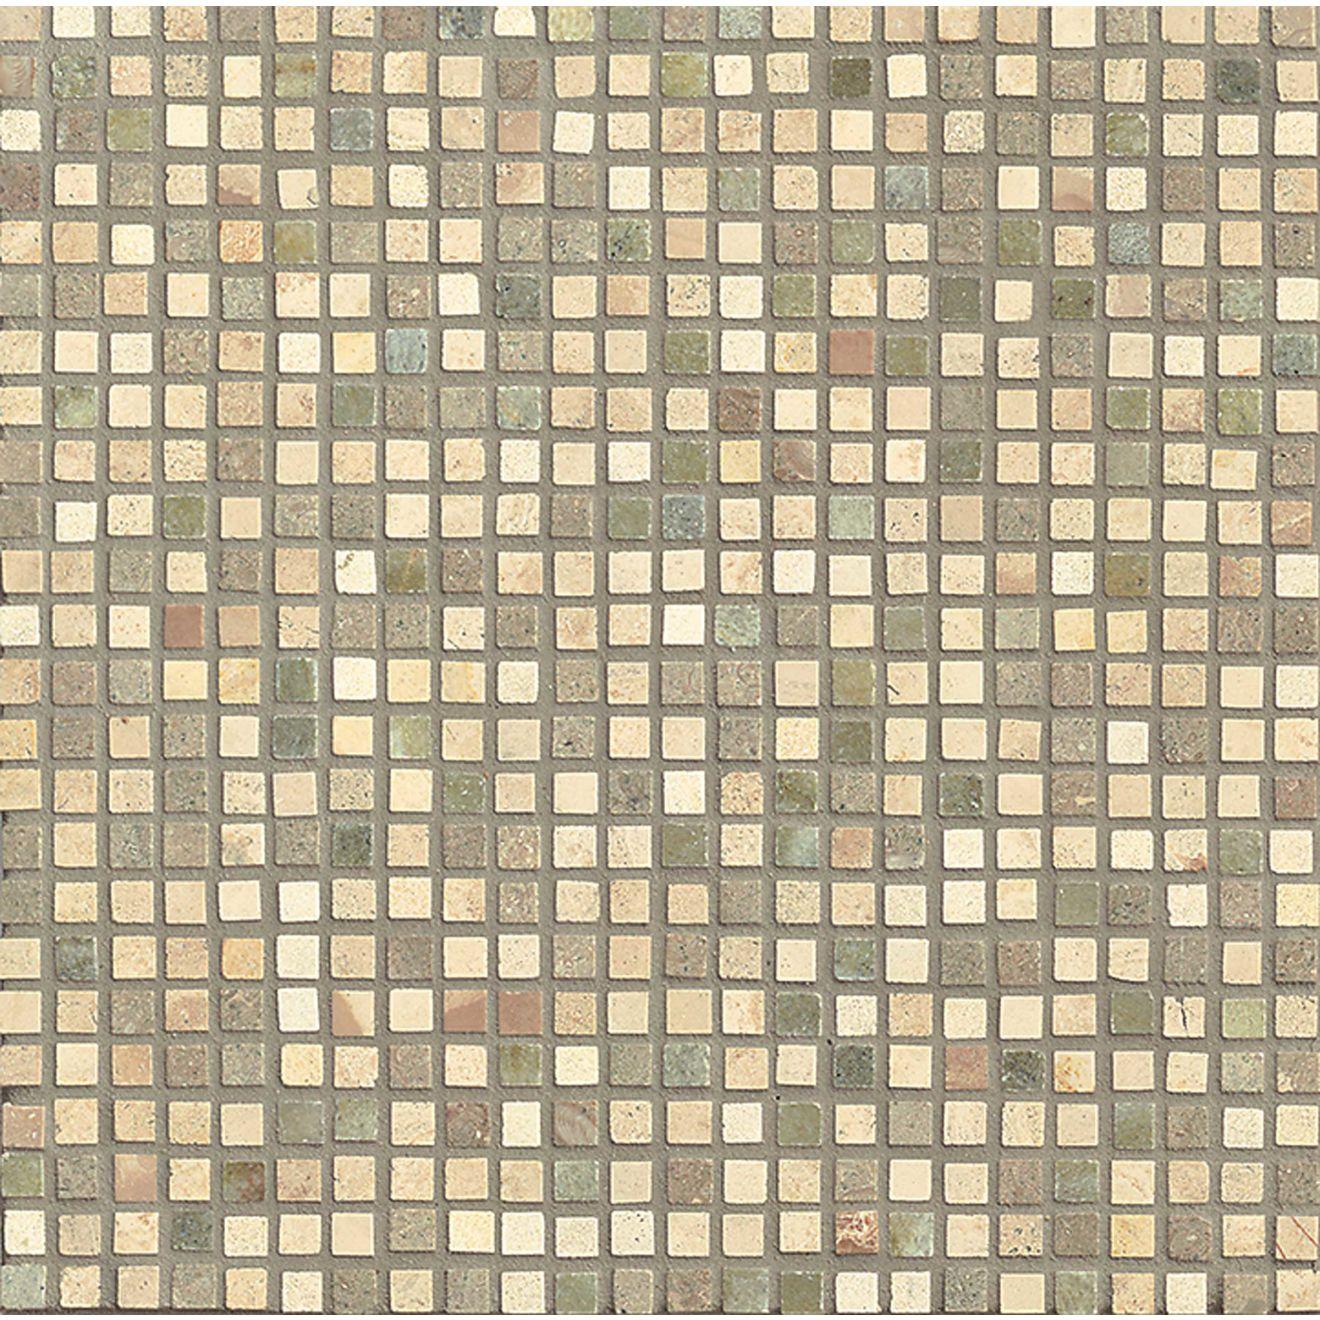 "Menage et Trois 3/8"" x 3/8"" Floor & Wall Mosaic in Crema, Tepenade, Verde Laguna"